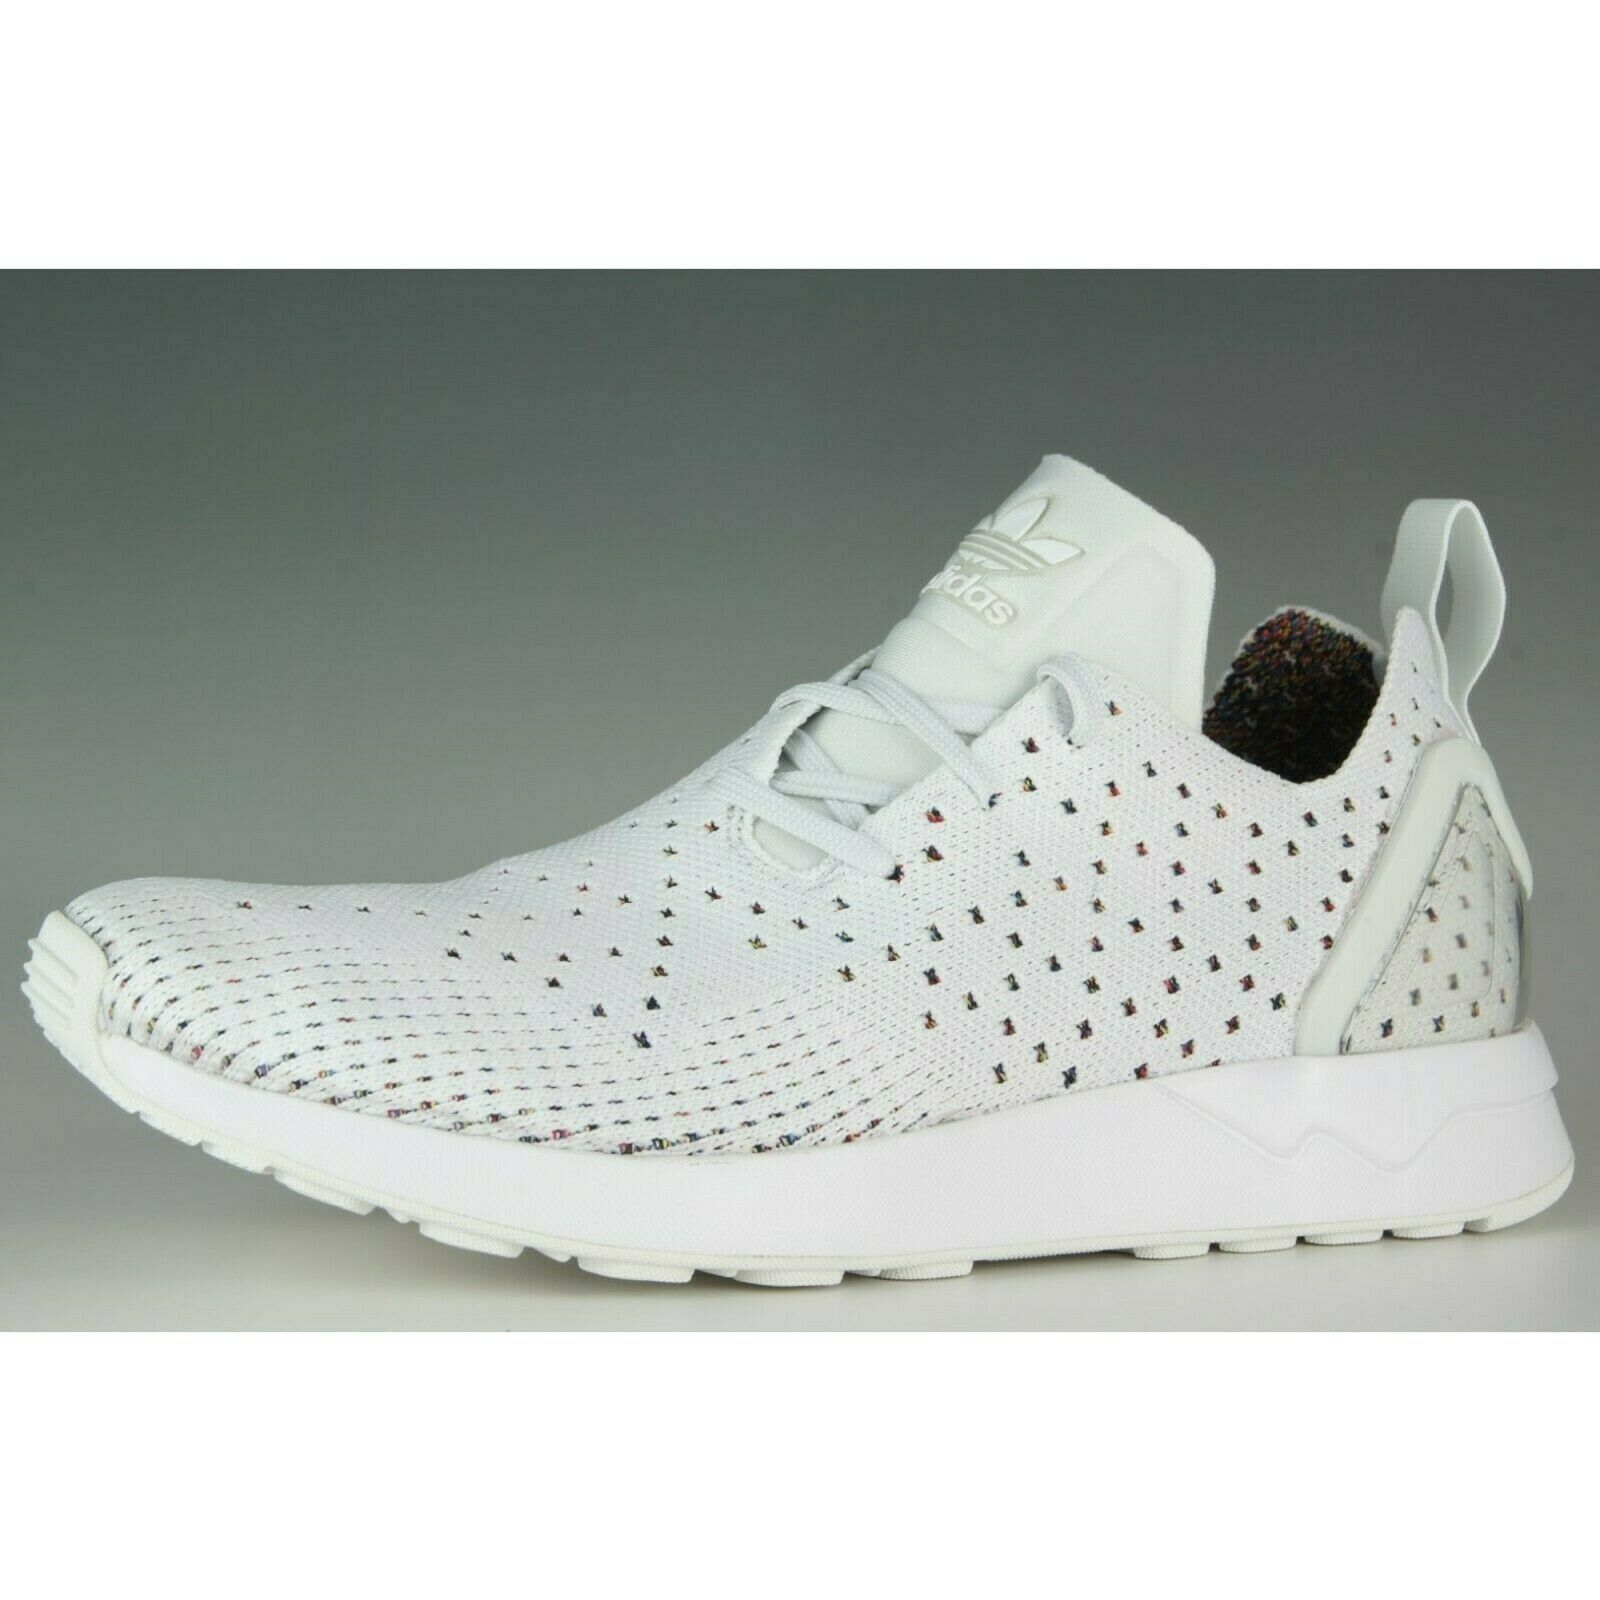 Adidas ZX Flux ADV ASYM PK Herren Schuhe Neu OVP Turnschuhe Größe EUR 41 1 3 adidas